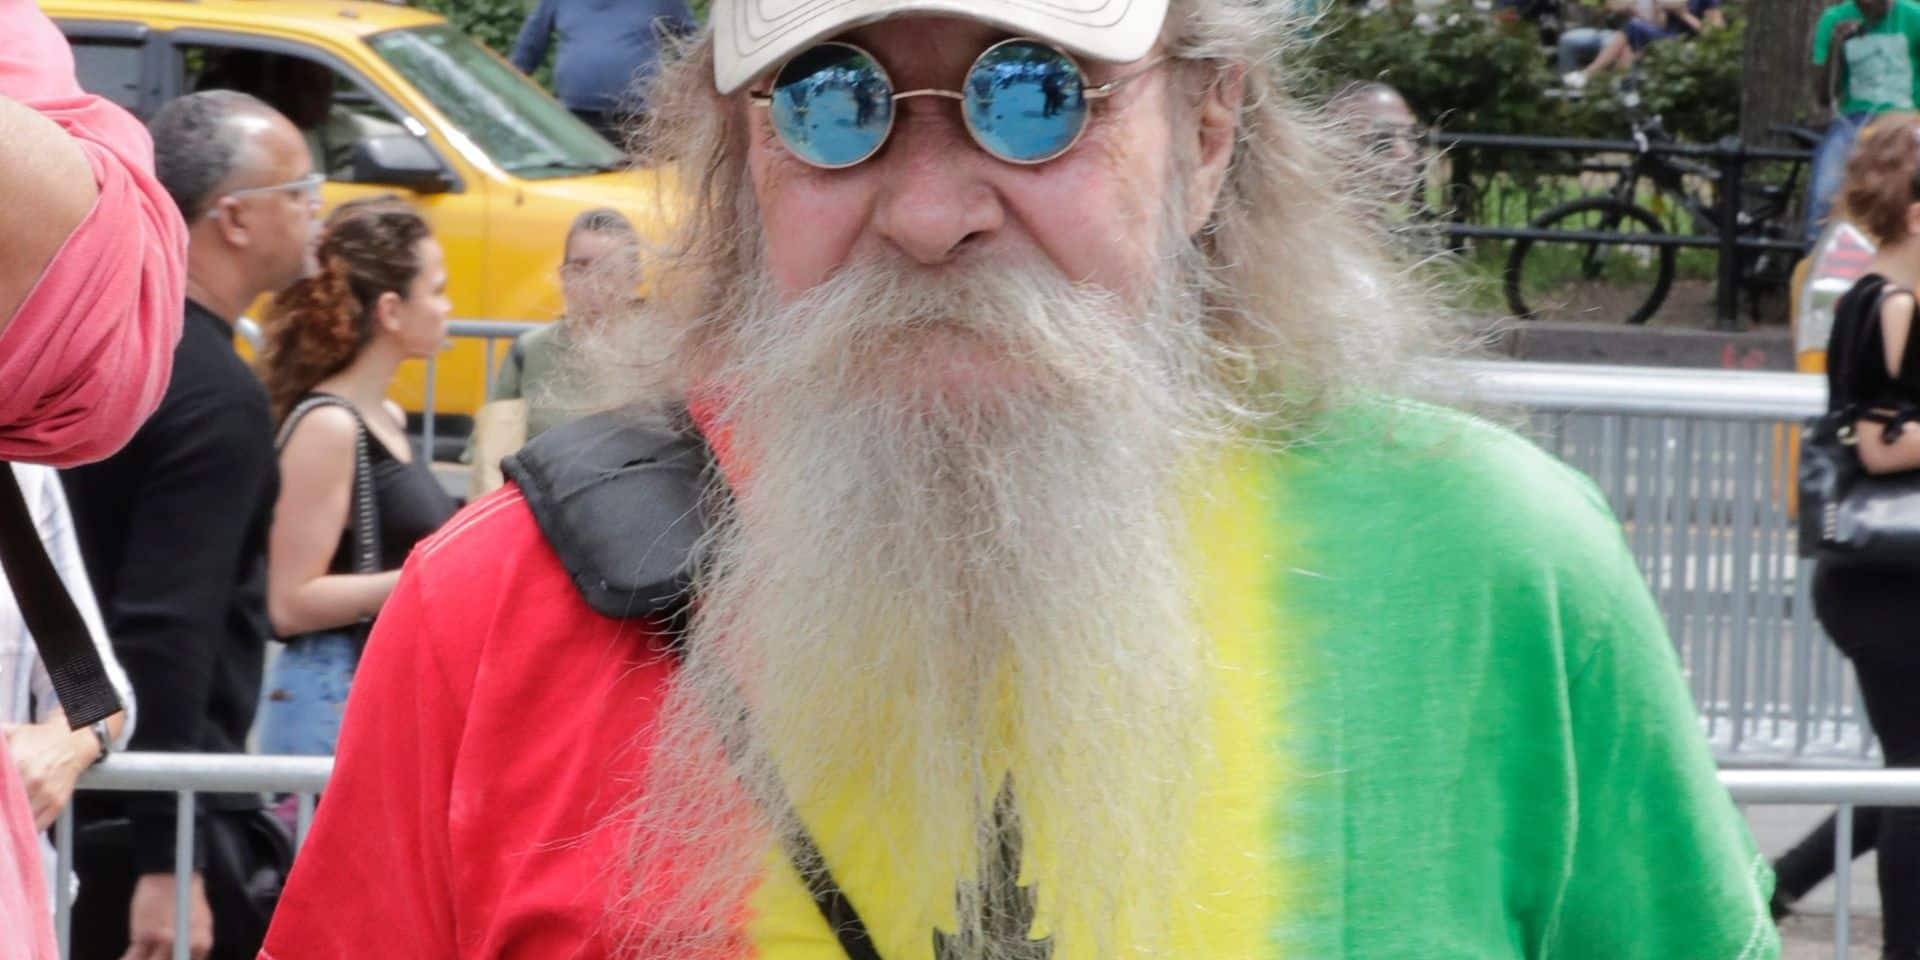 NYC Cannabis Parade & Rally 2018